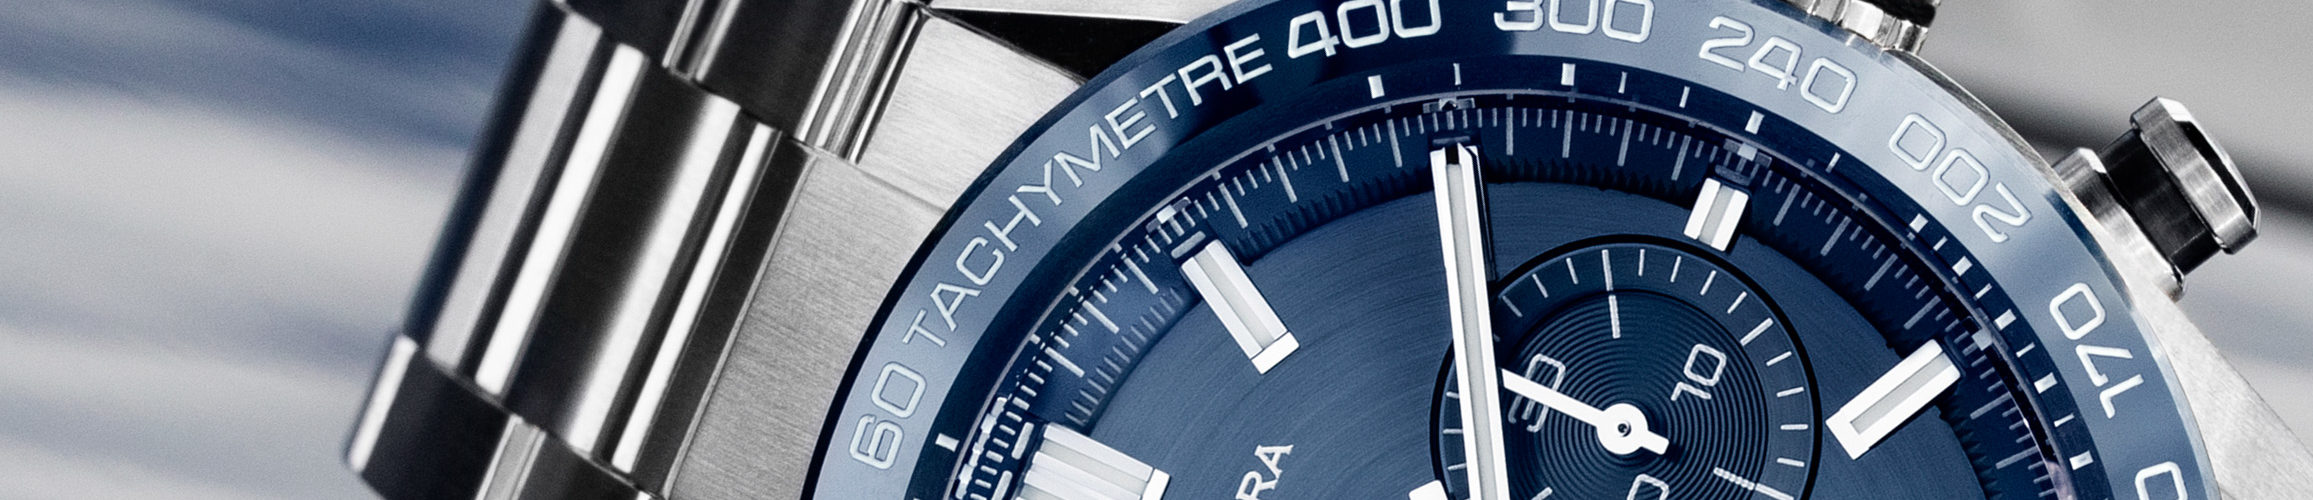 Tachymeter-Uhr-Skala 3